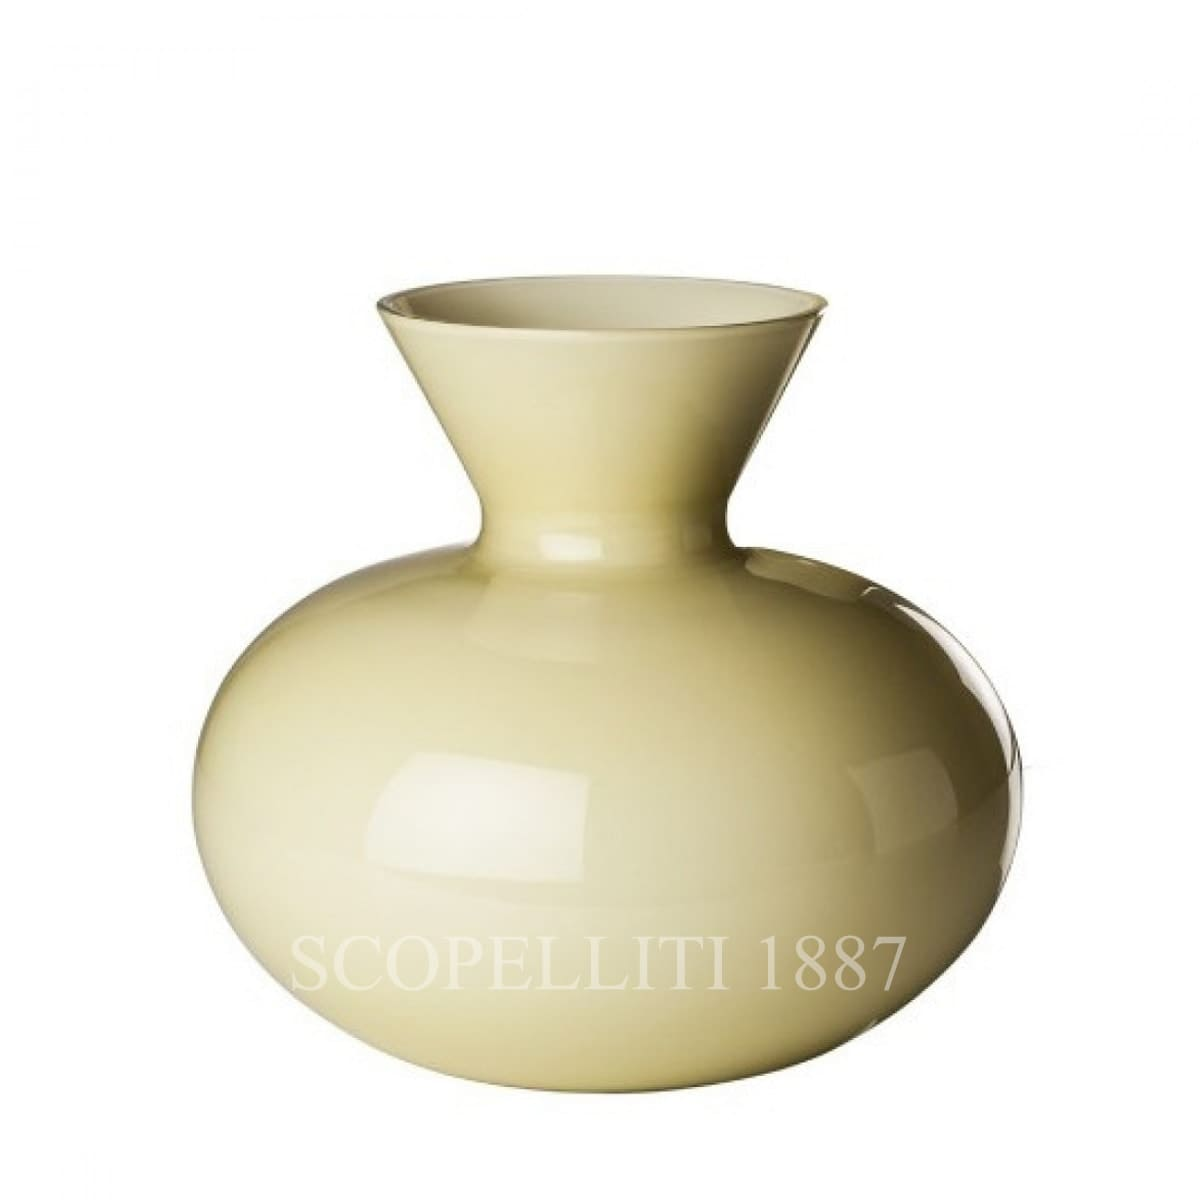 Venini Idria large Vase straw yellow 706.41